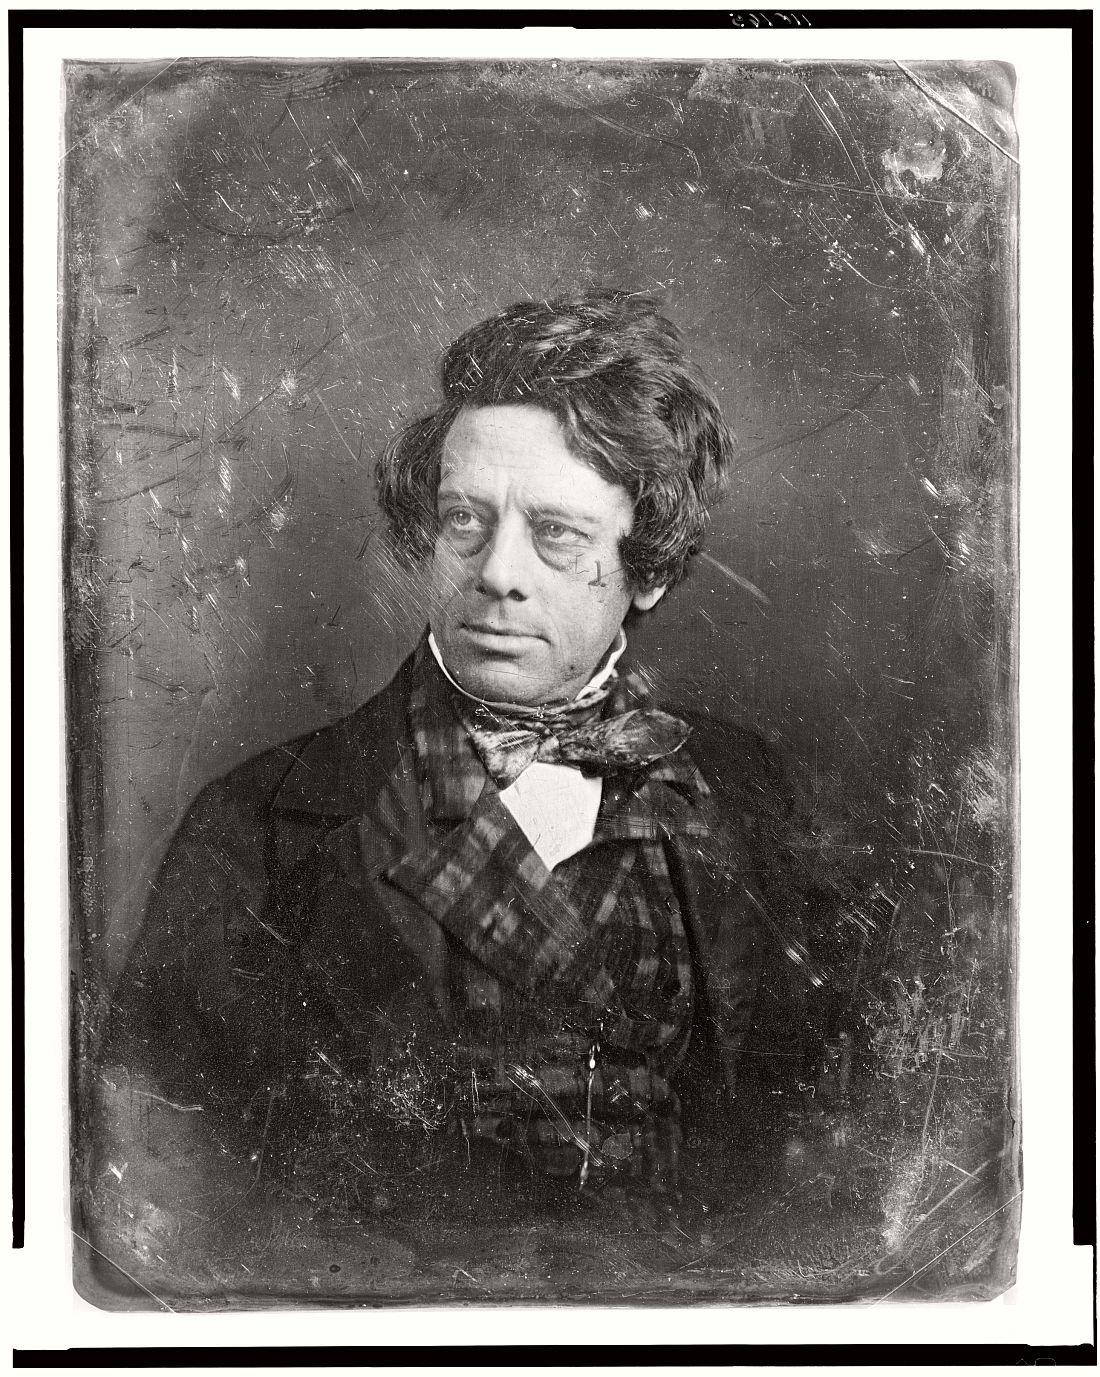 vintage-daguerreotype-portraits-from-xix-century-1844-1860-63